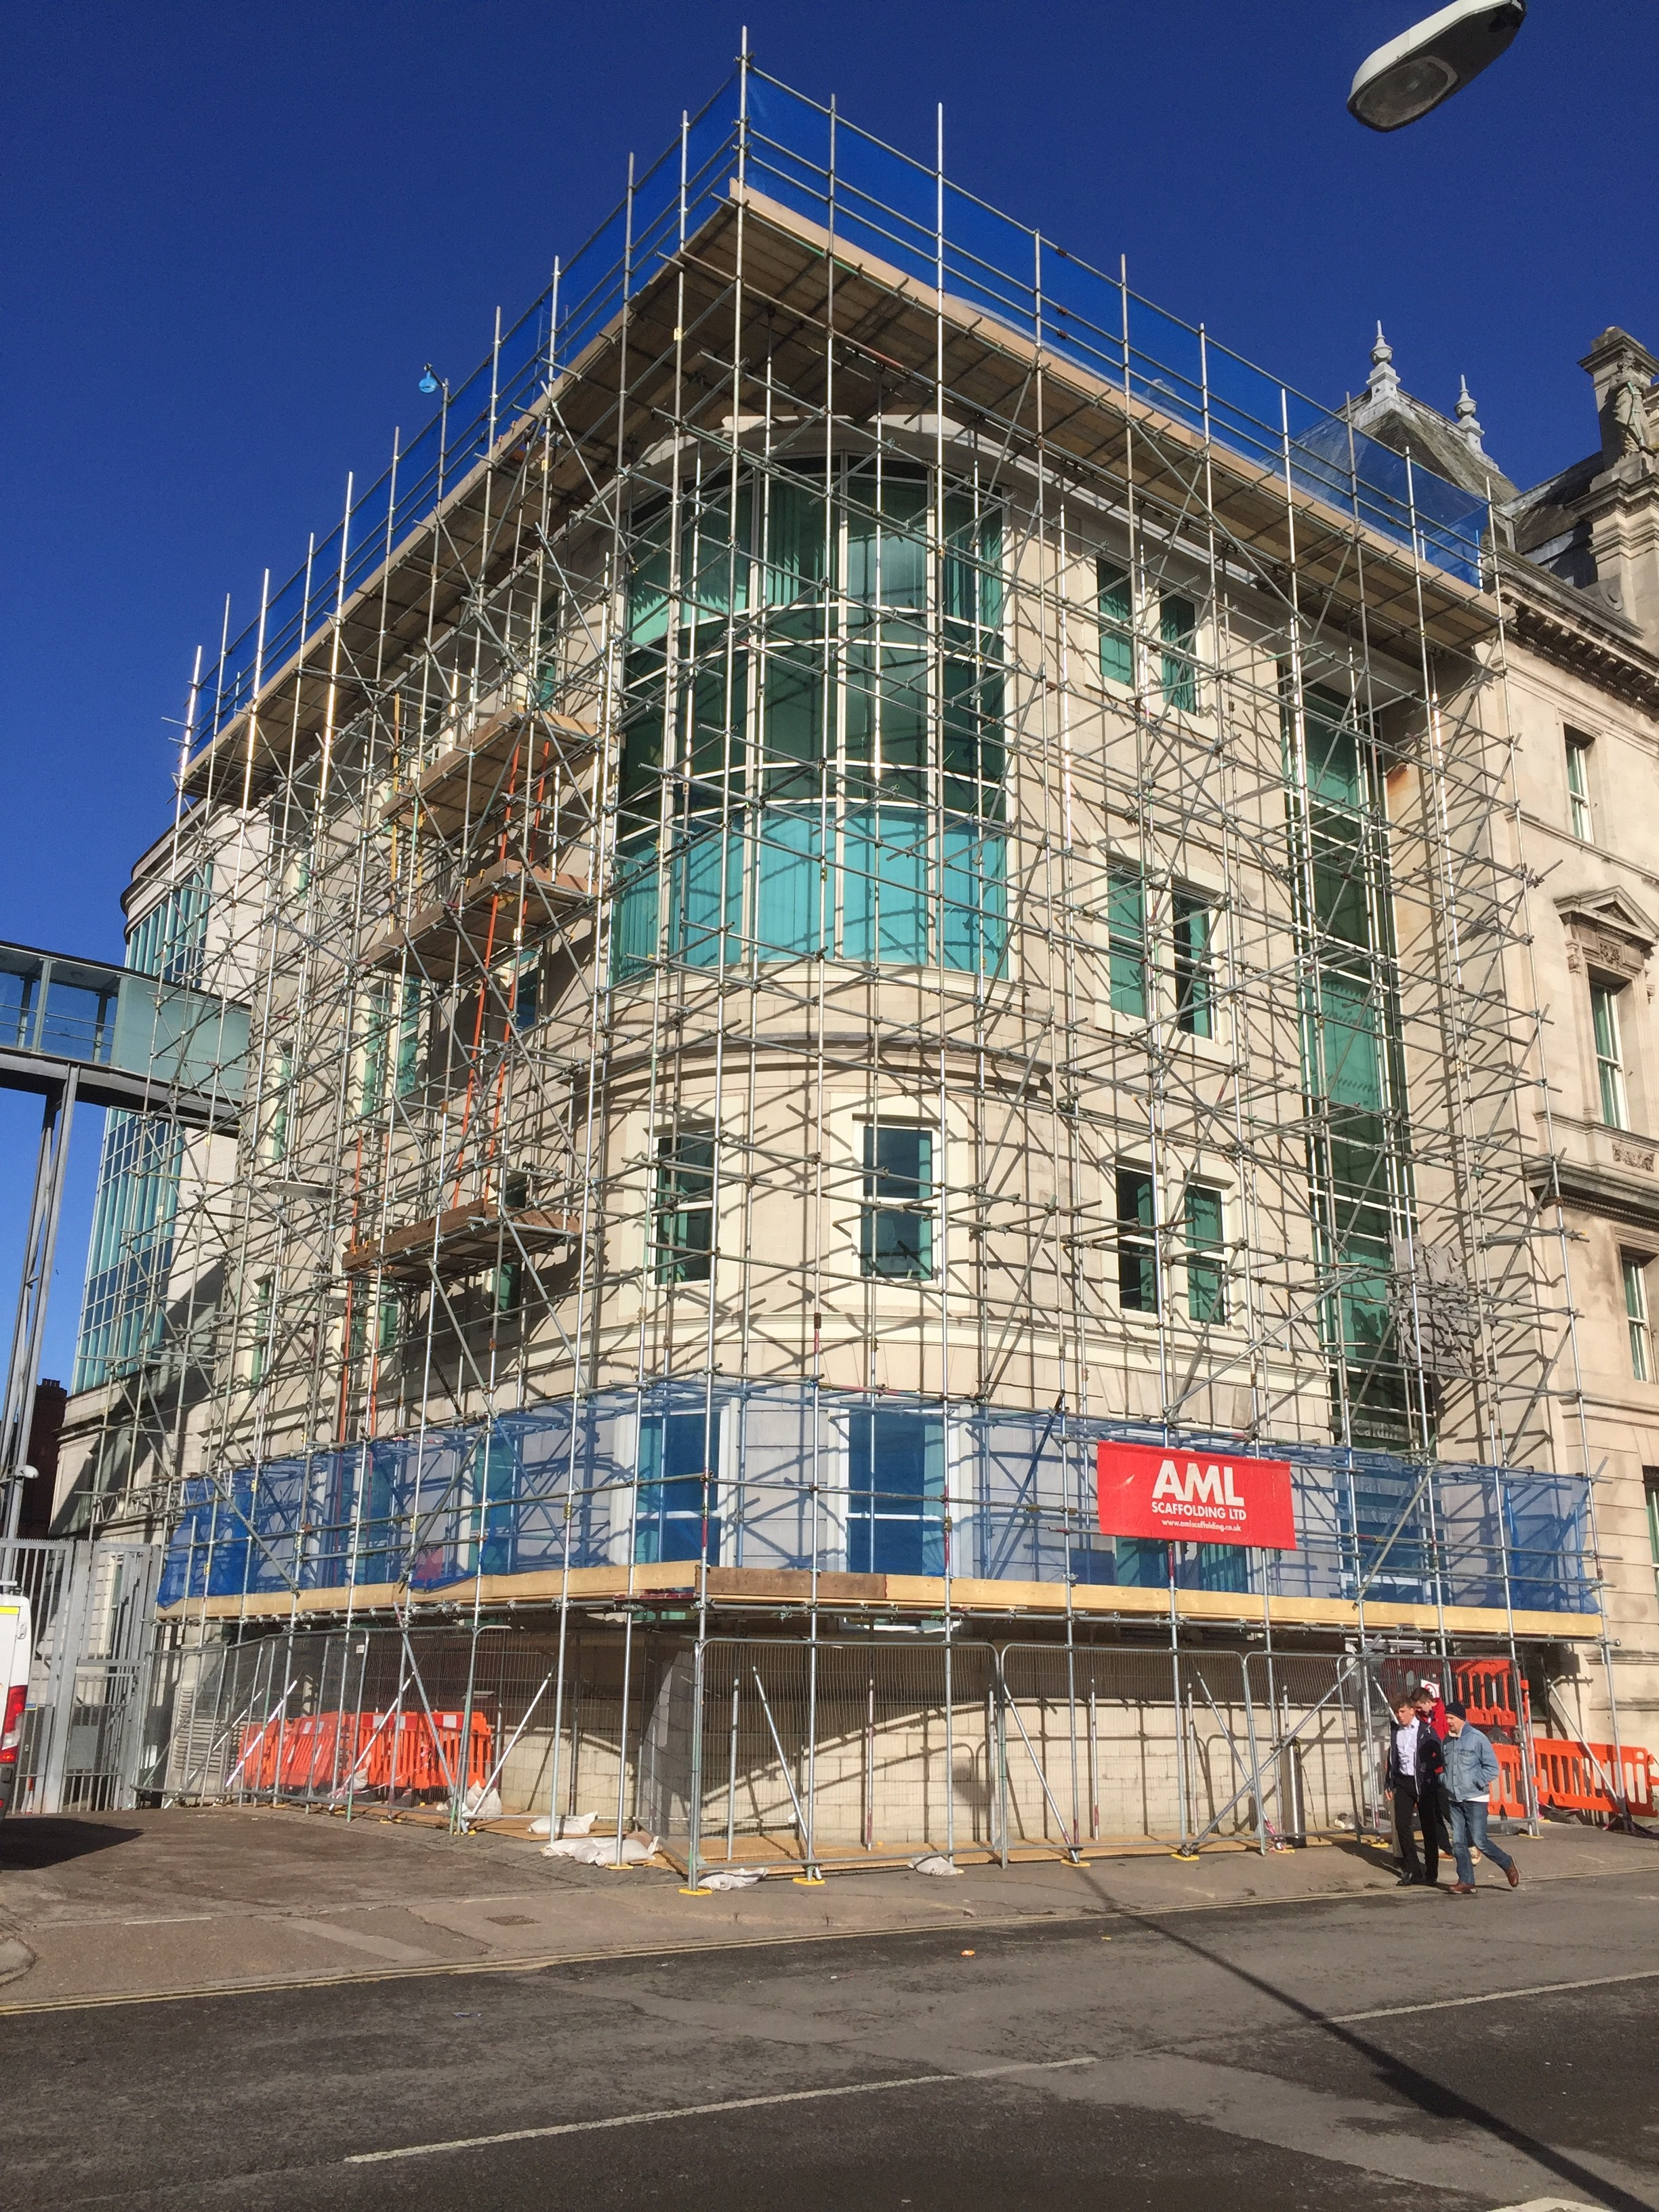 Cardiff Civil Justice Centre